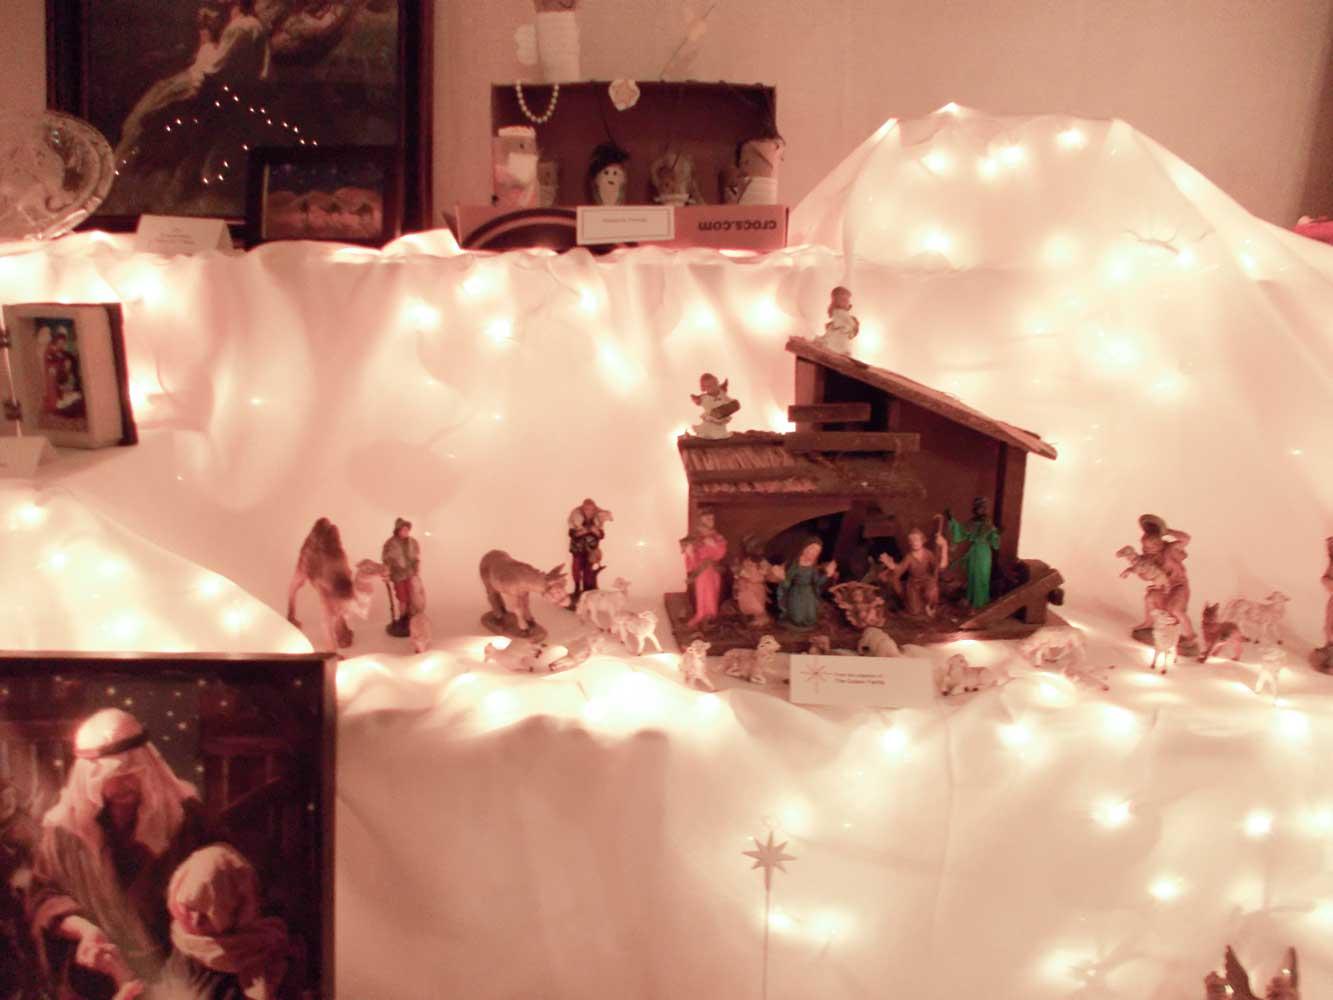 Clarksville Festival of the Nativity 2016